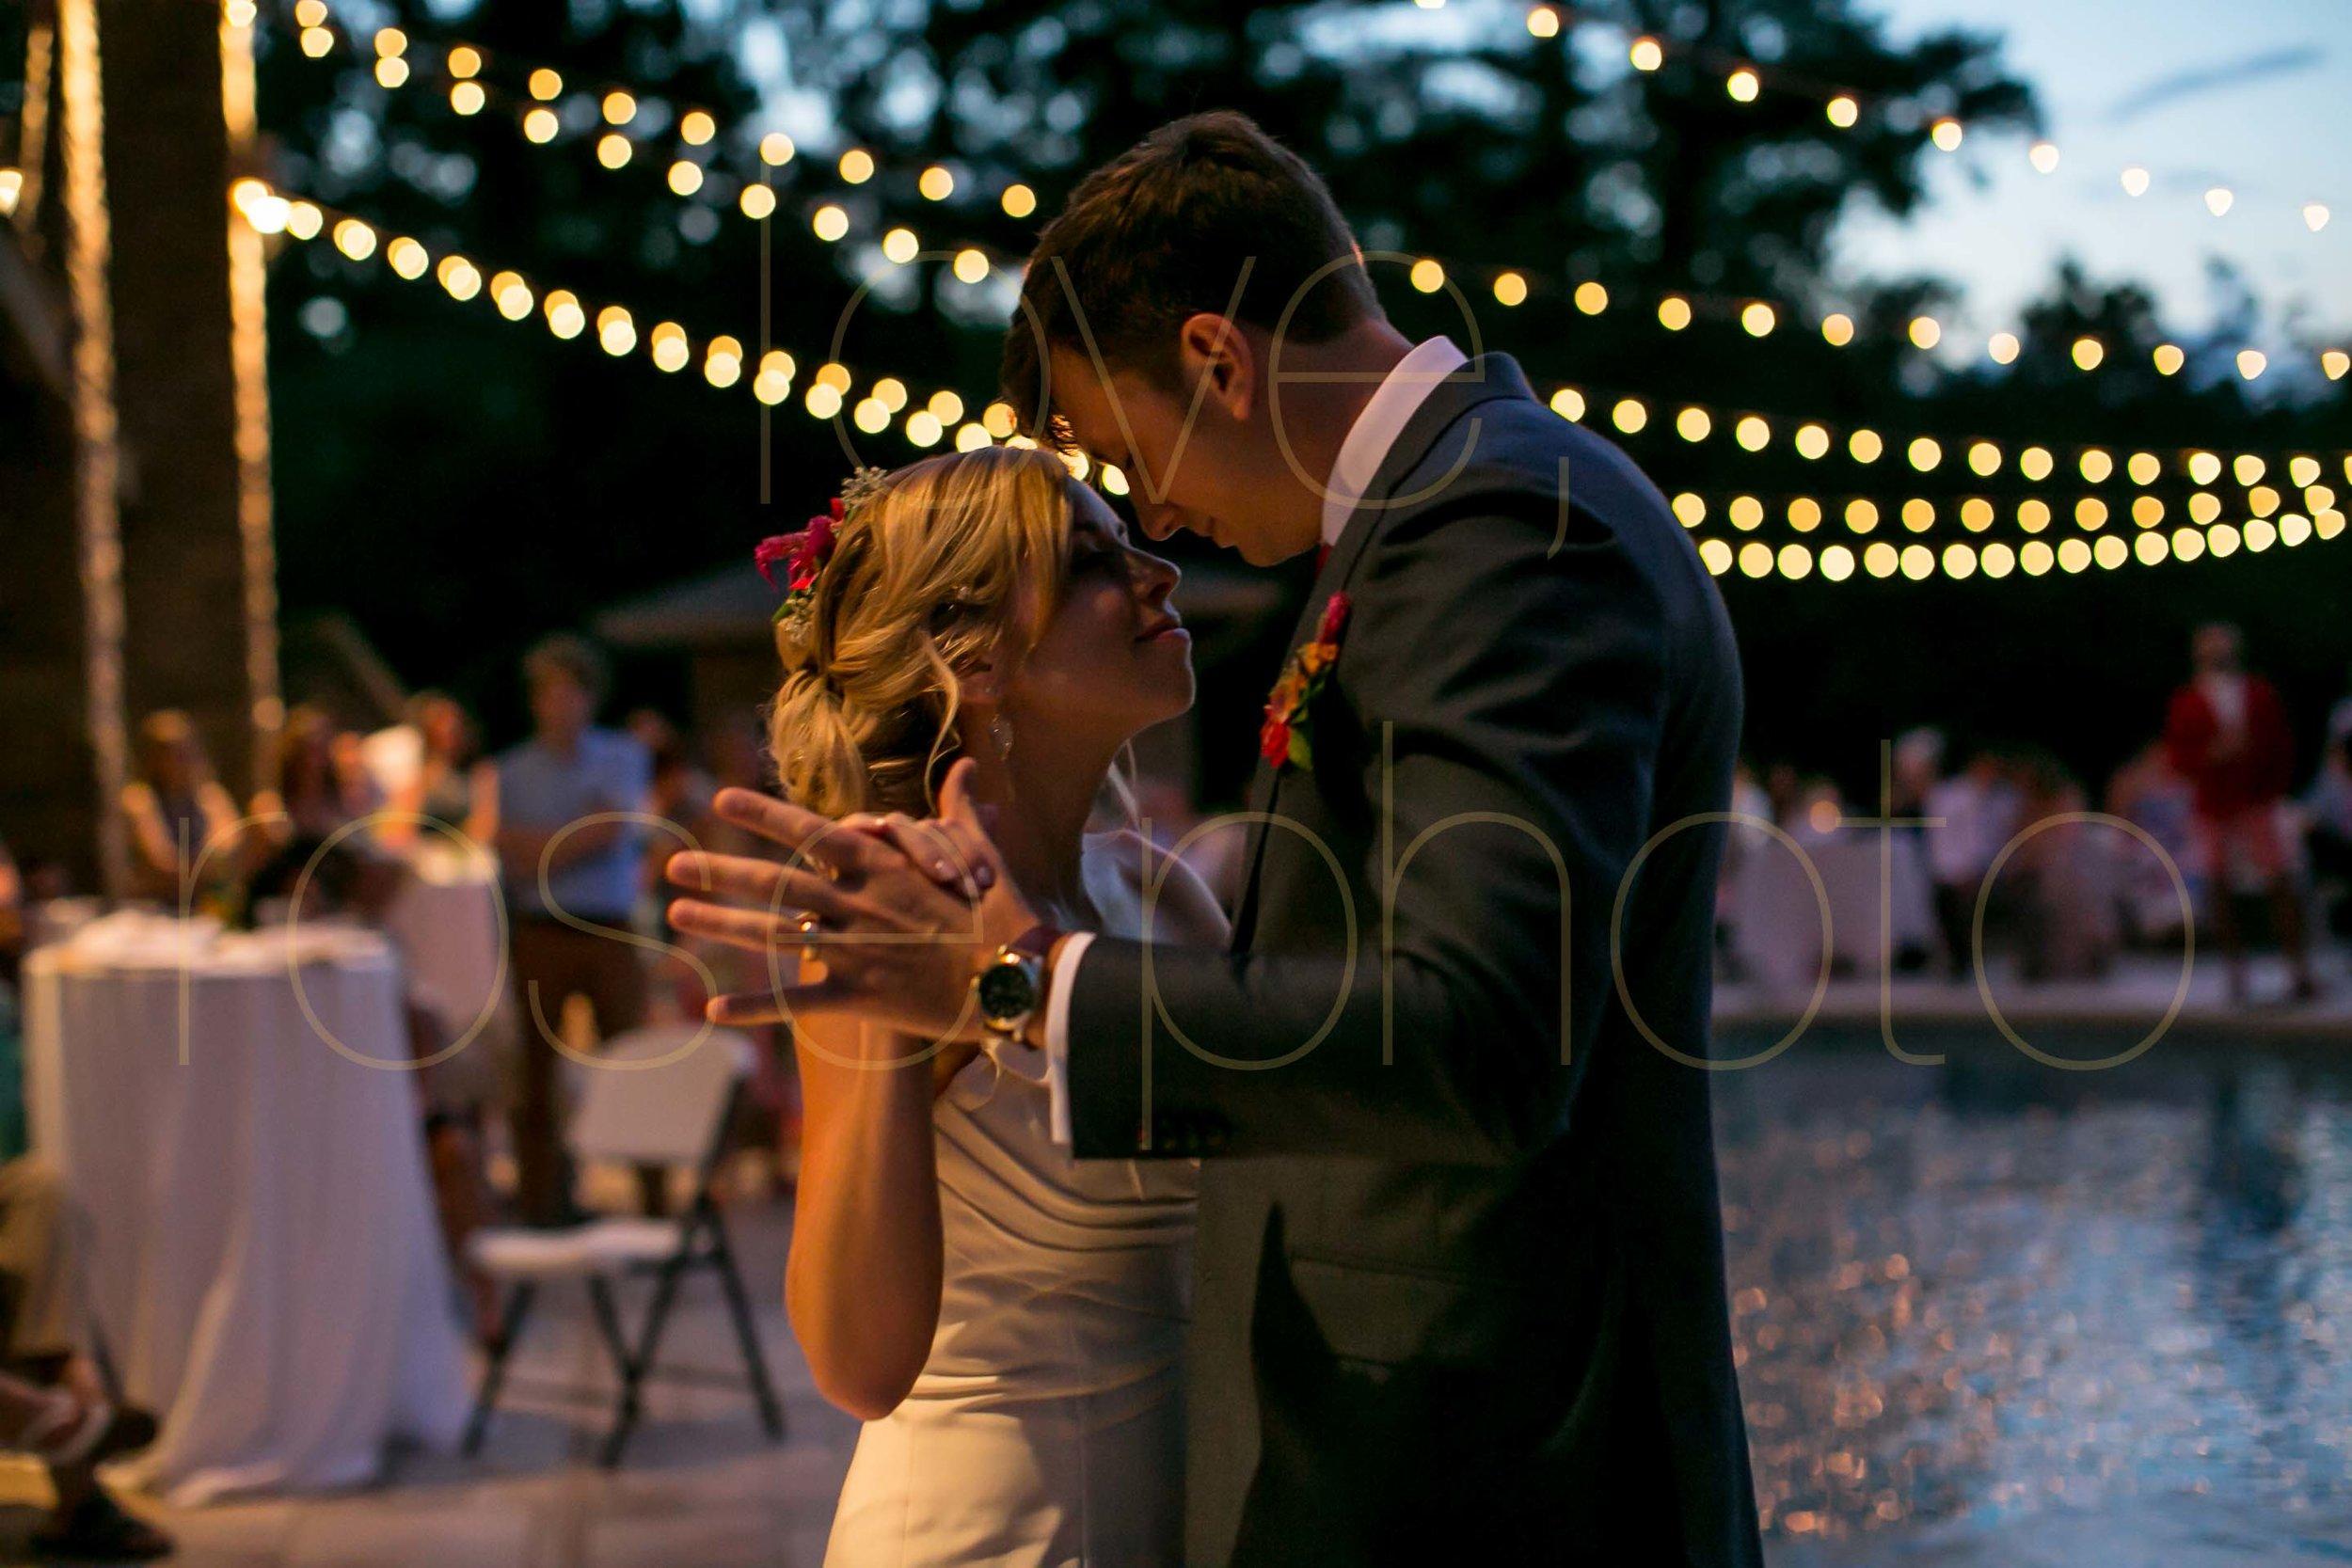 Rose Photo Asheville Wedding Photographer Nasheville Weddings Charleston Bride Chicago photojournalist weddings -55.jpg